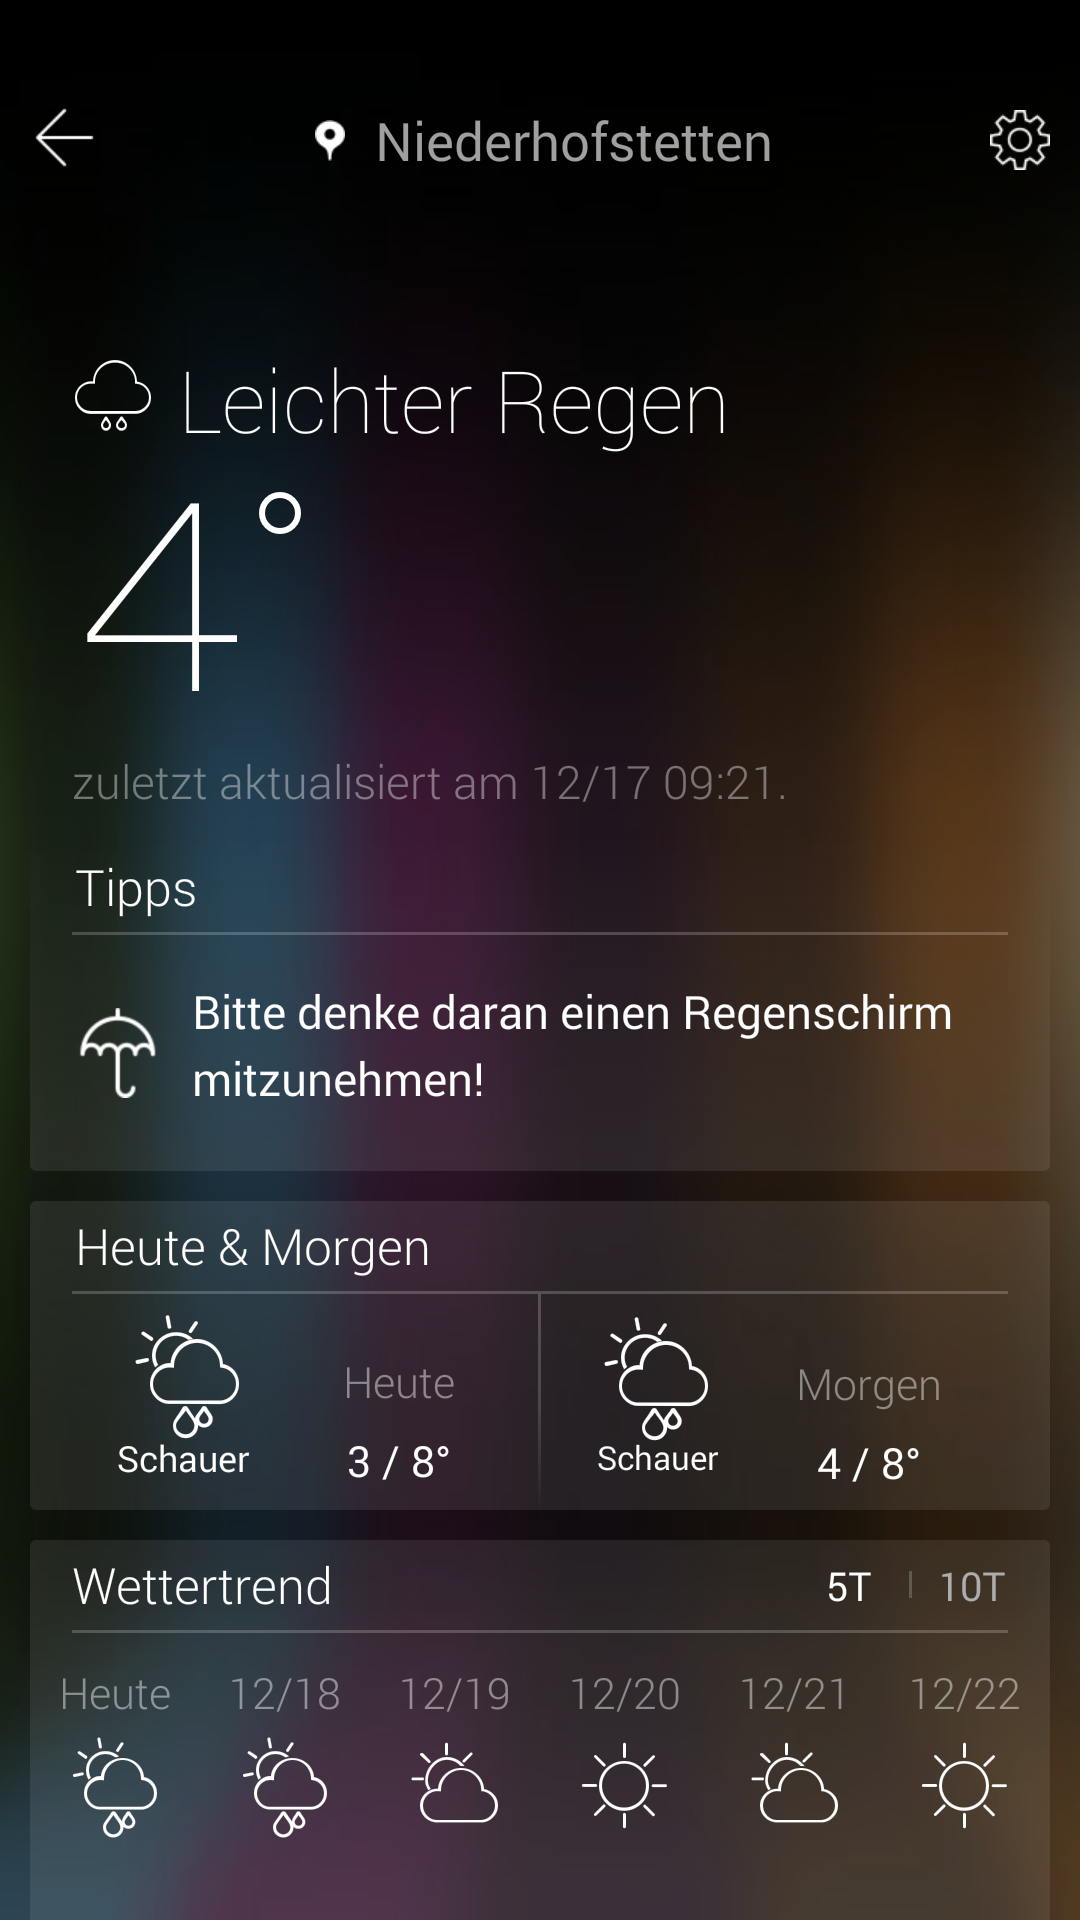 Screenshot_2015-12-17-10-16-36.png